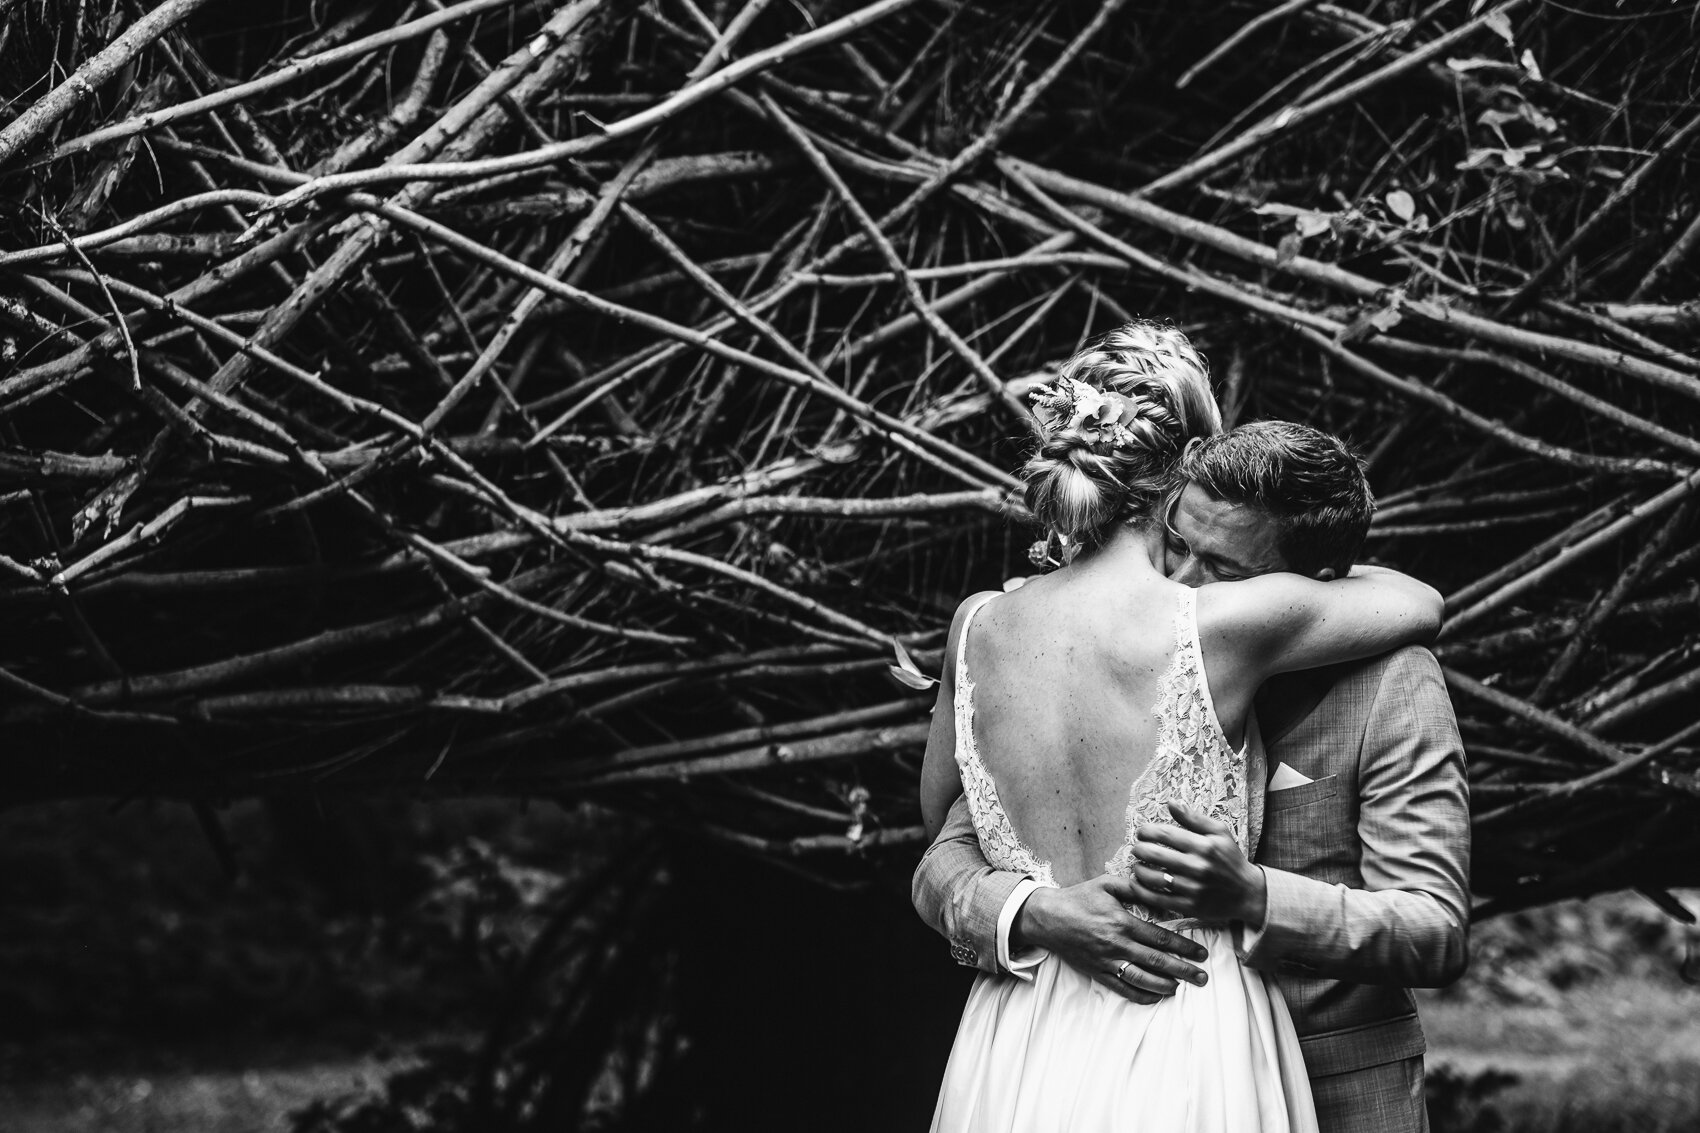 iso800 - huwelijksfotograaf isabo matthias verbeke foundation-8.jpg